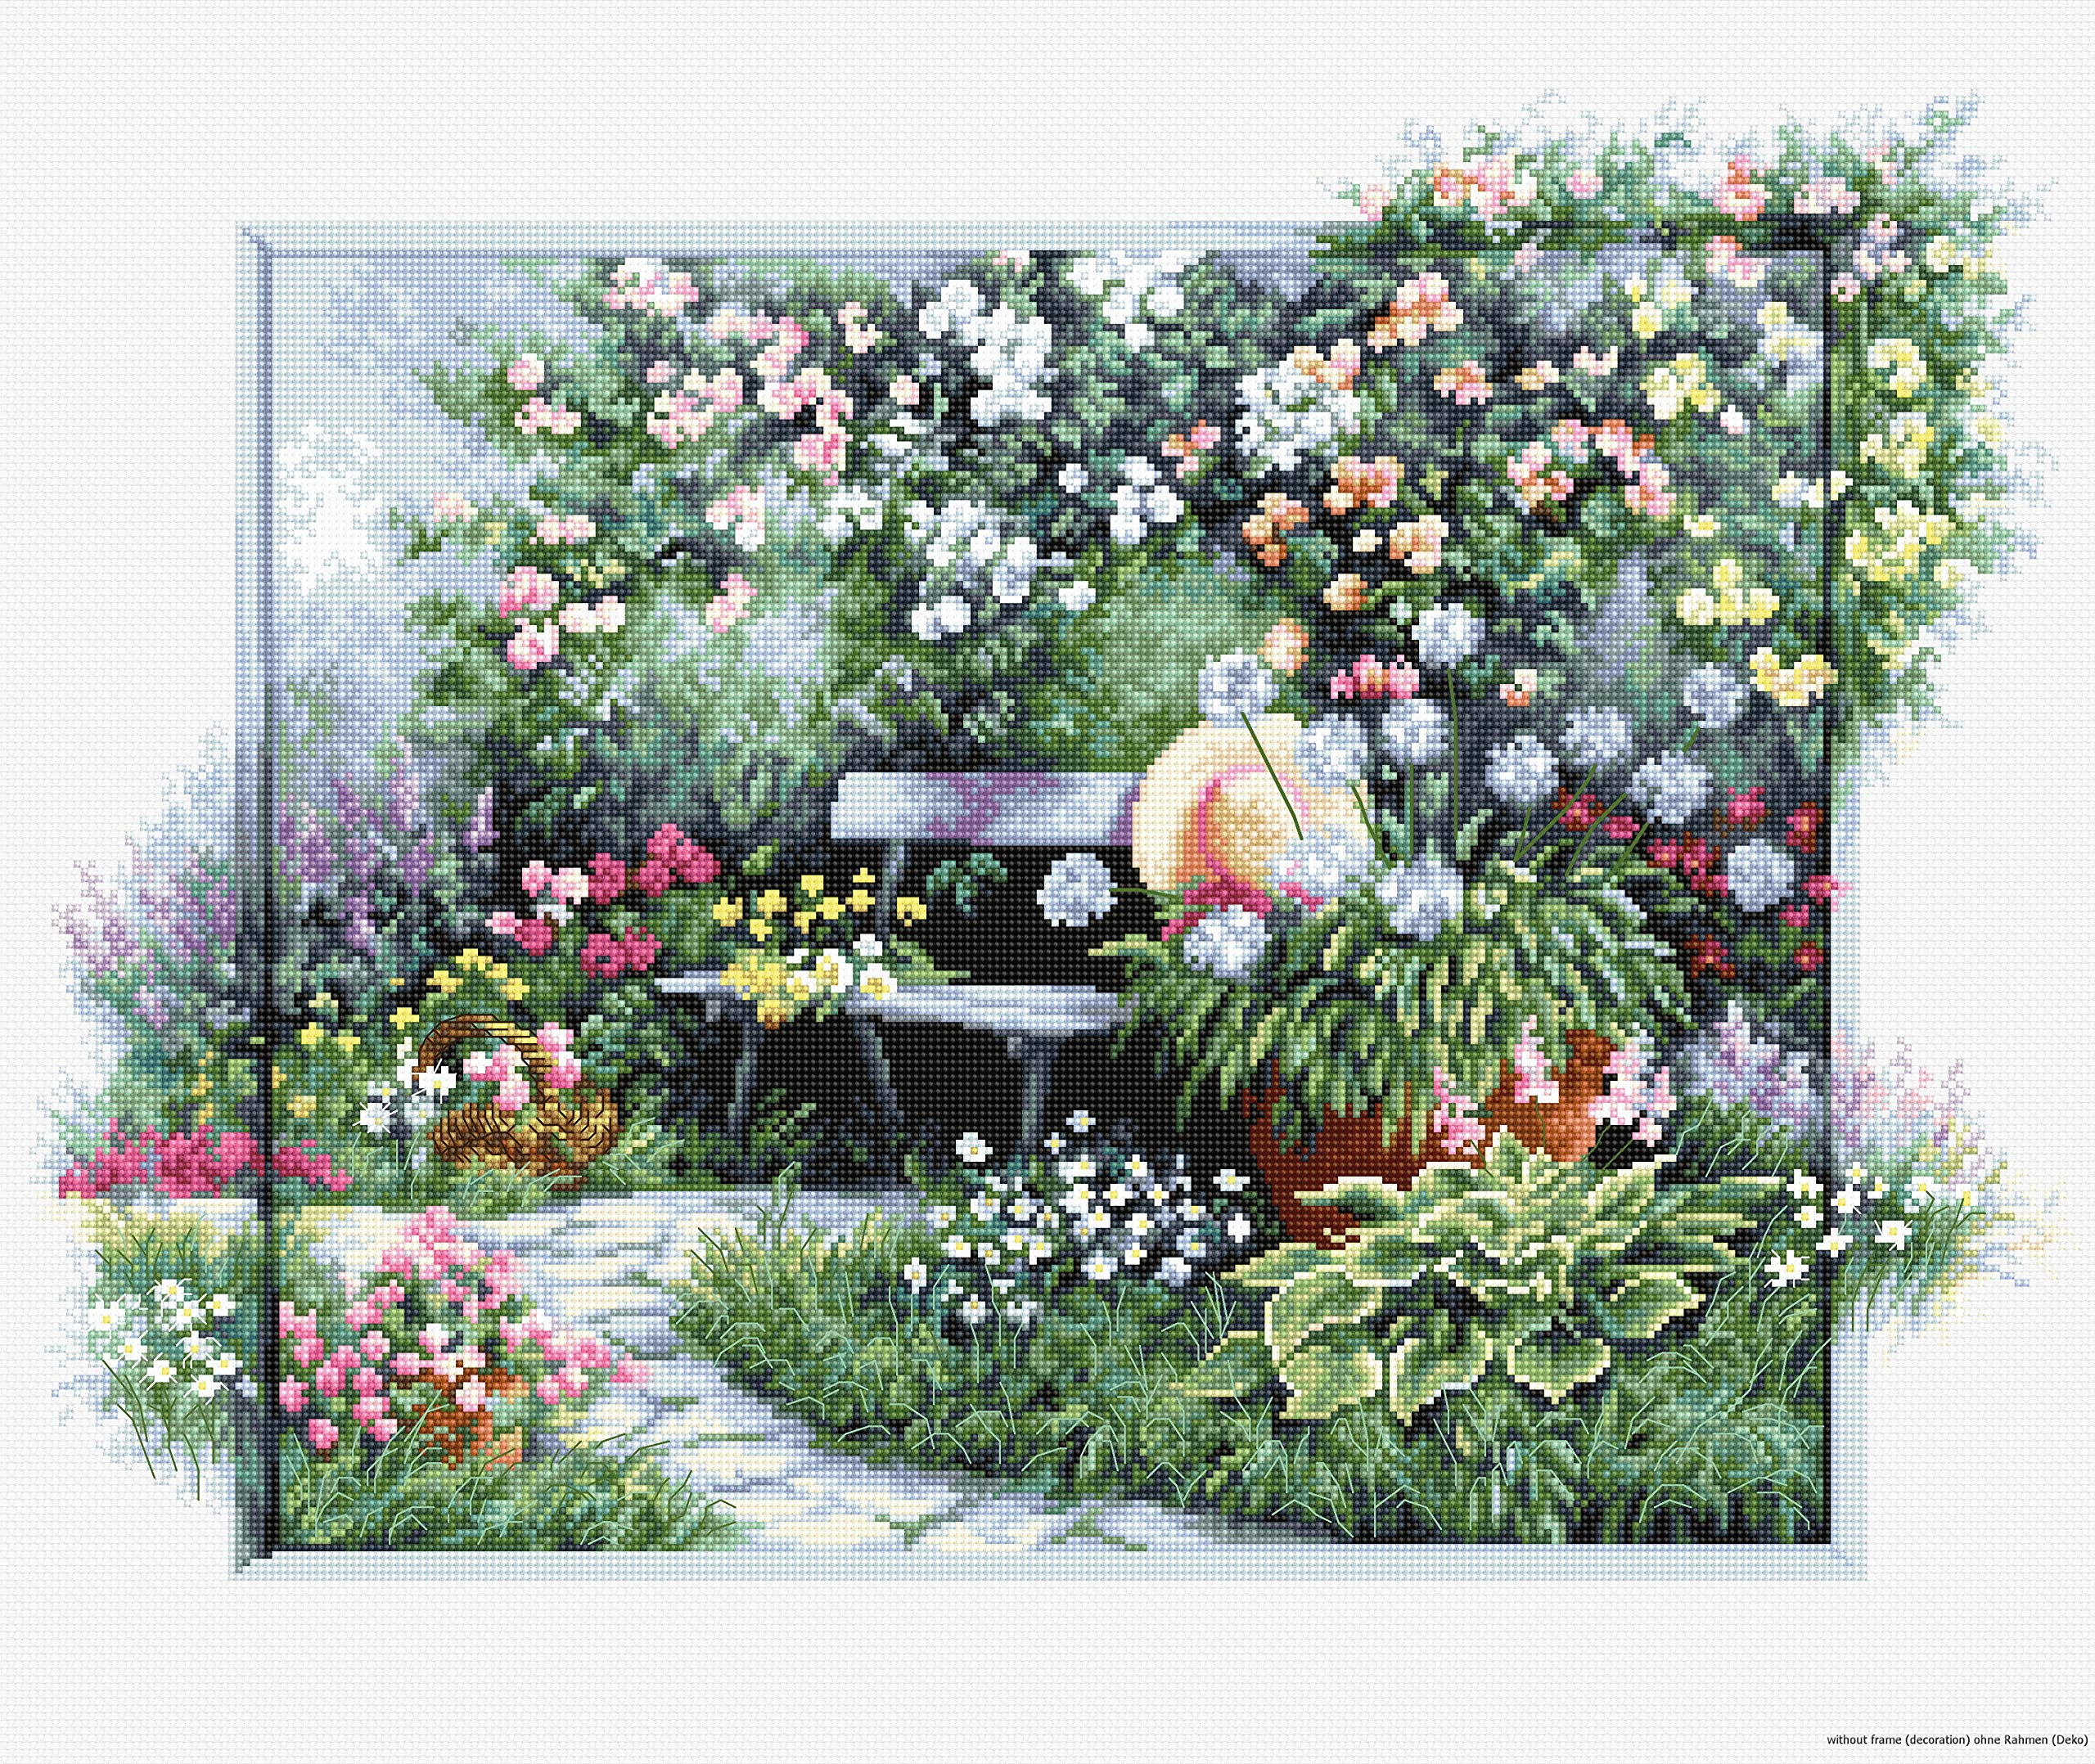 Luca-S BU4012 Flower Garden Bench Cross Stitch Kit Cotton, Multicoloured, 44.5 x 32.5 cm